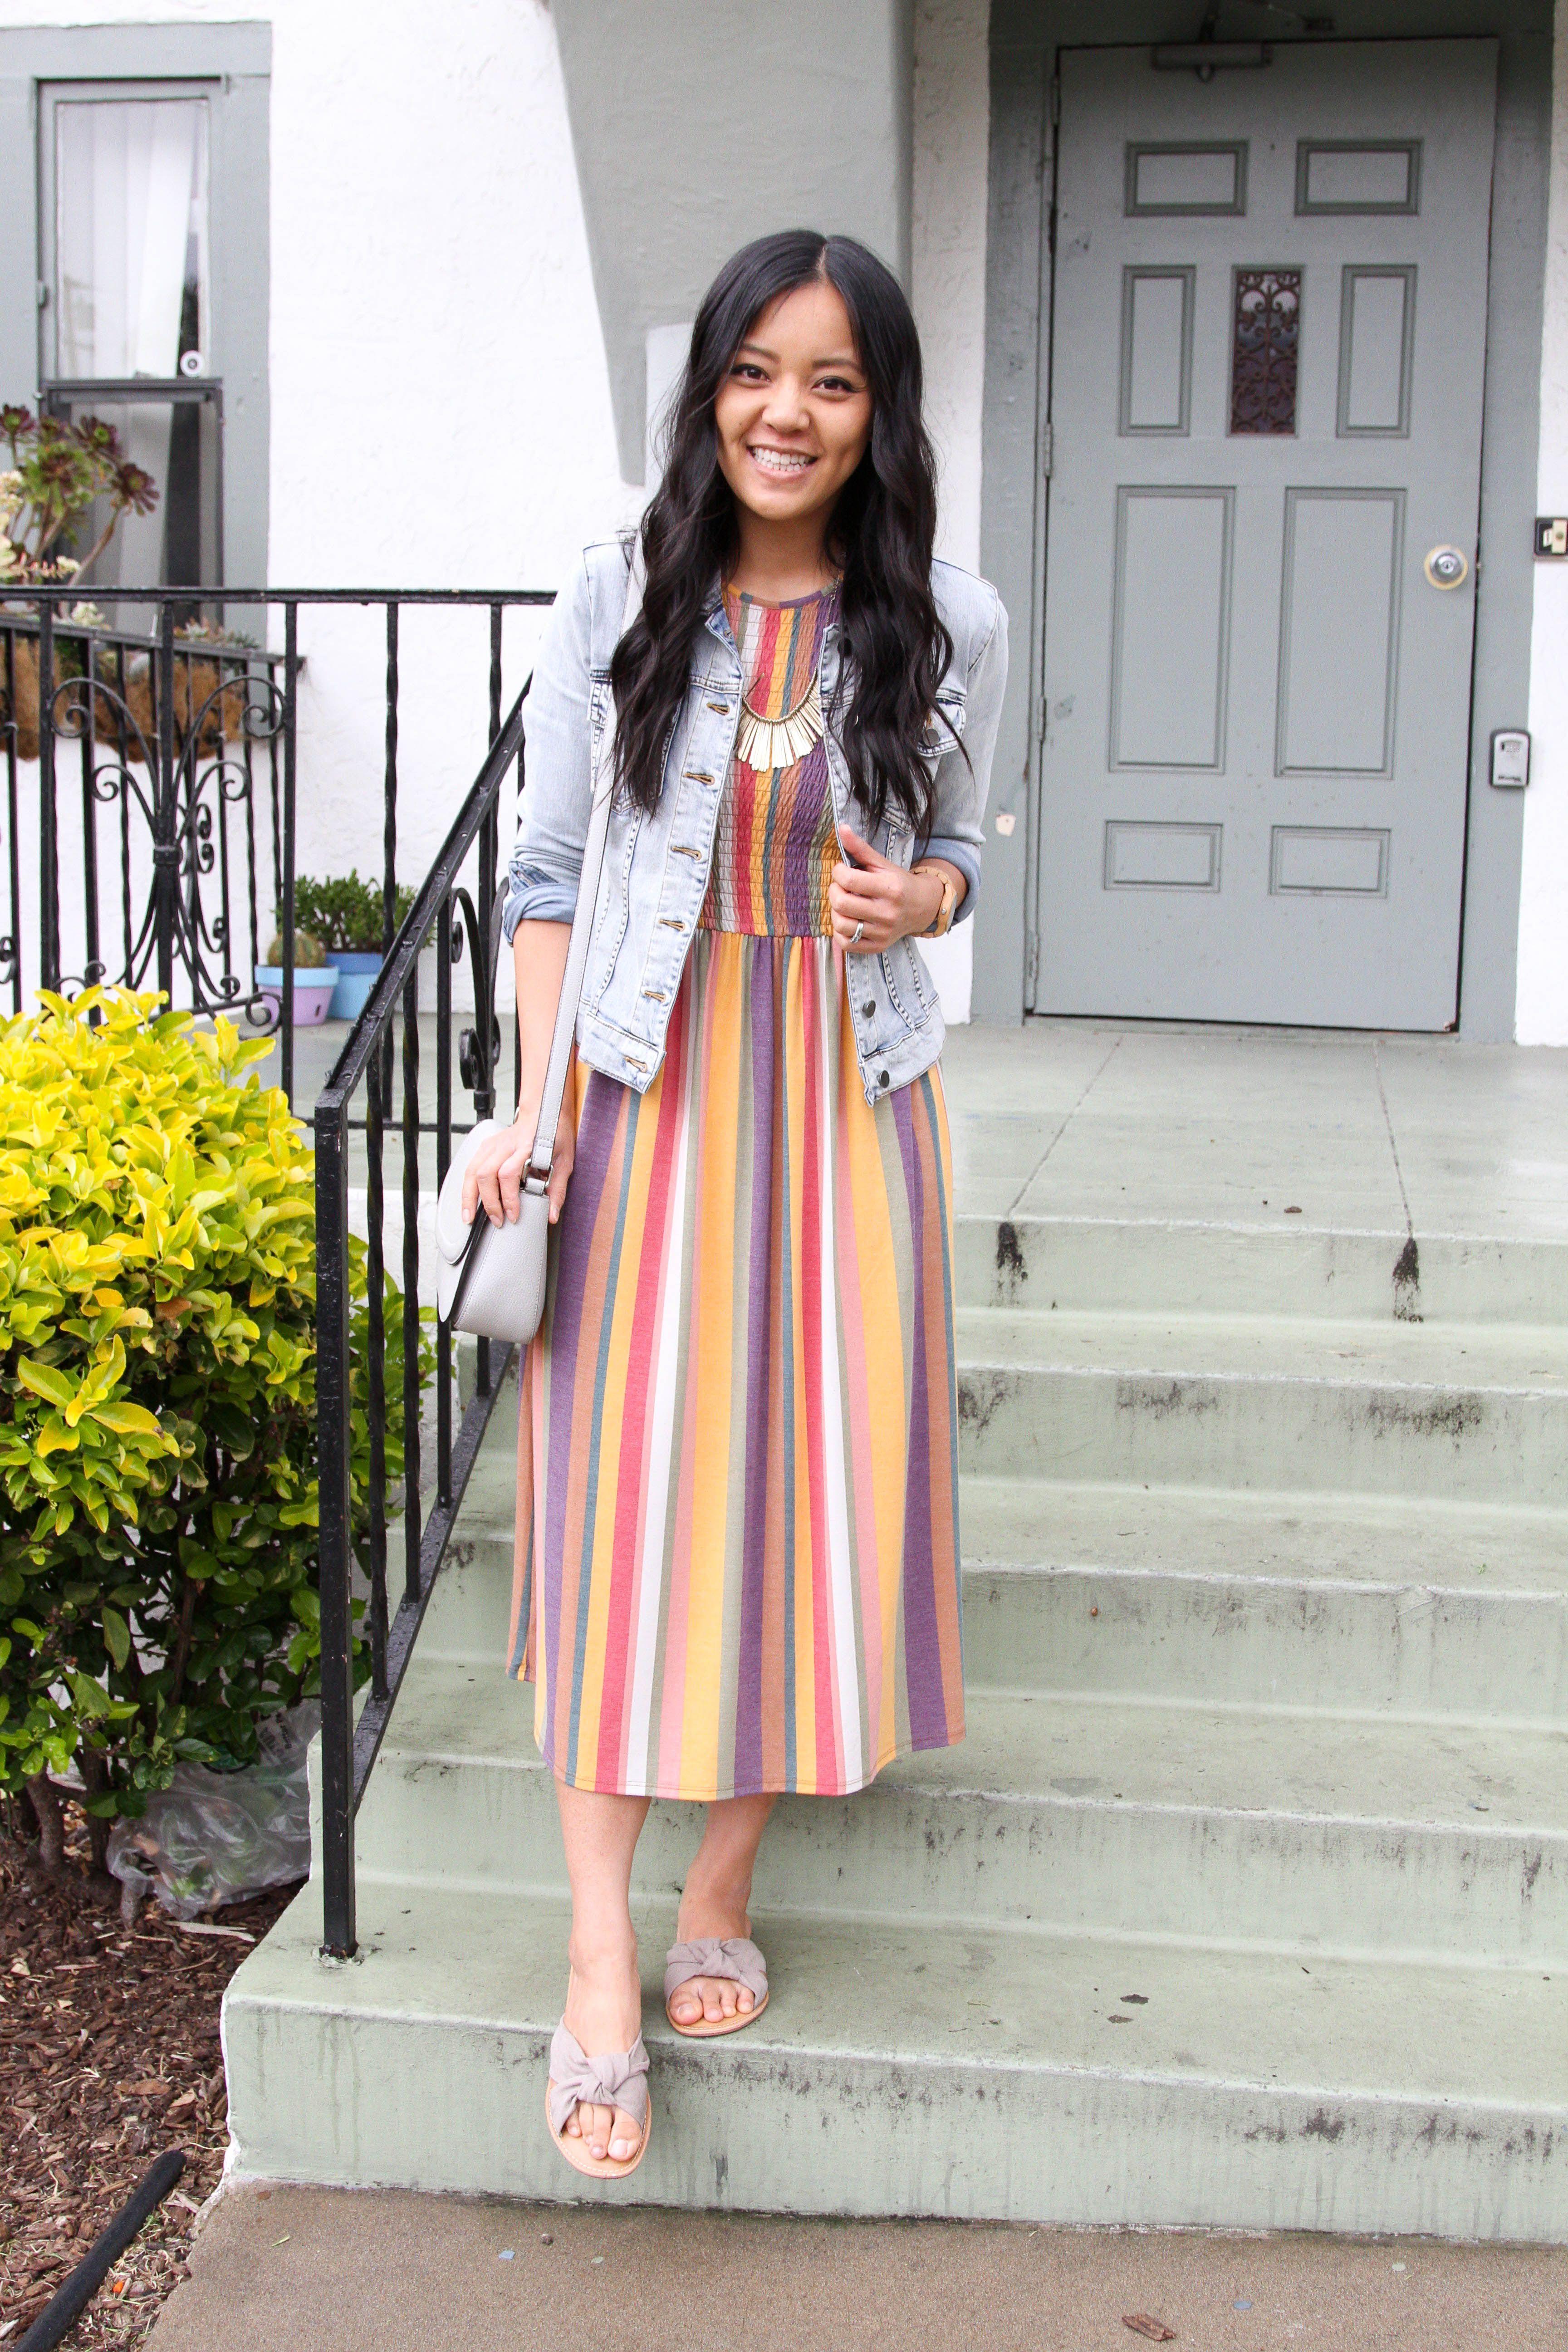 fd9bea1dabb6 striped maxi dress + denim jacket + grey purse + sandals + statement  necklace